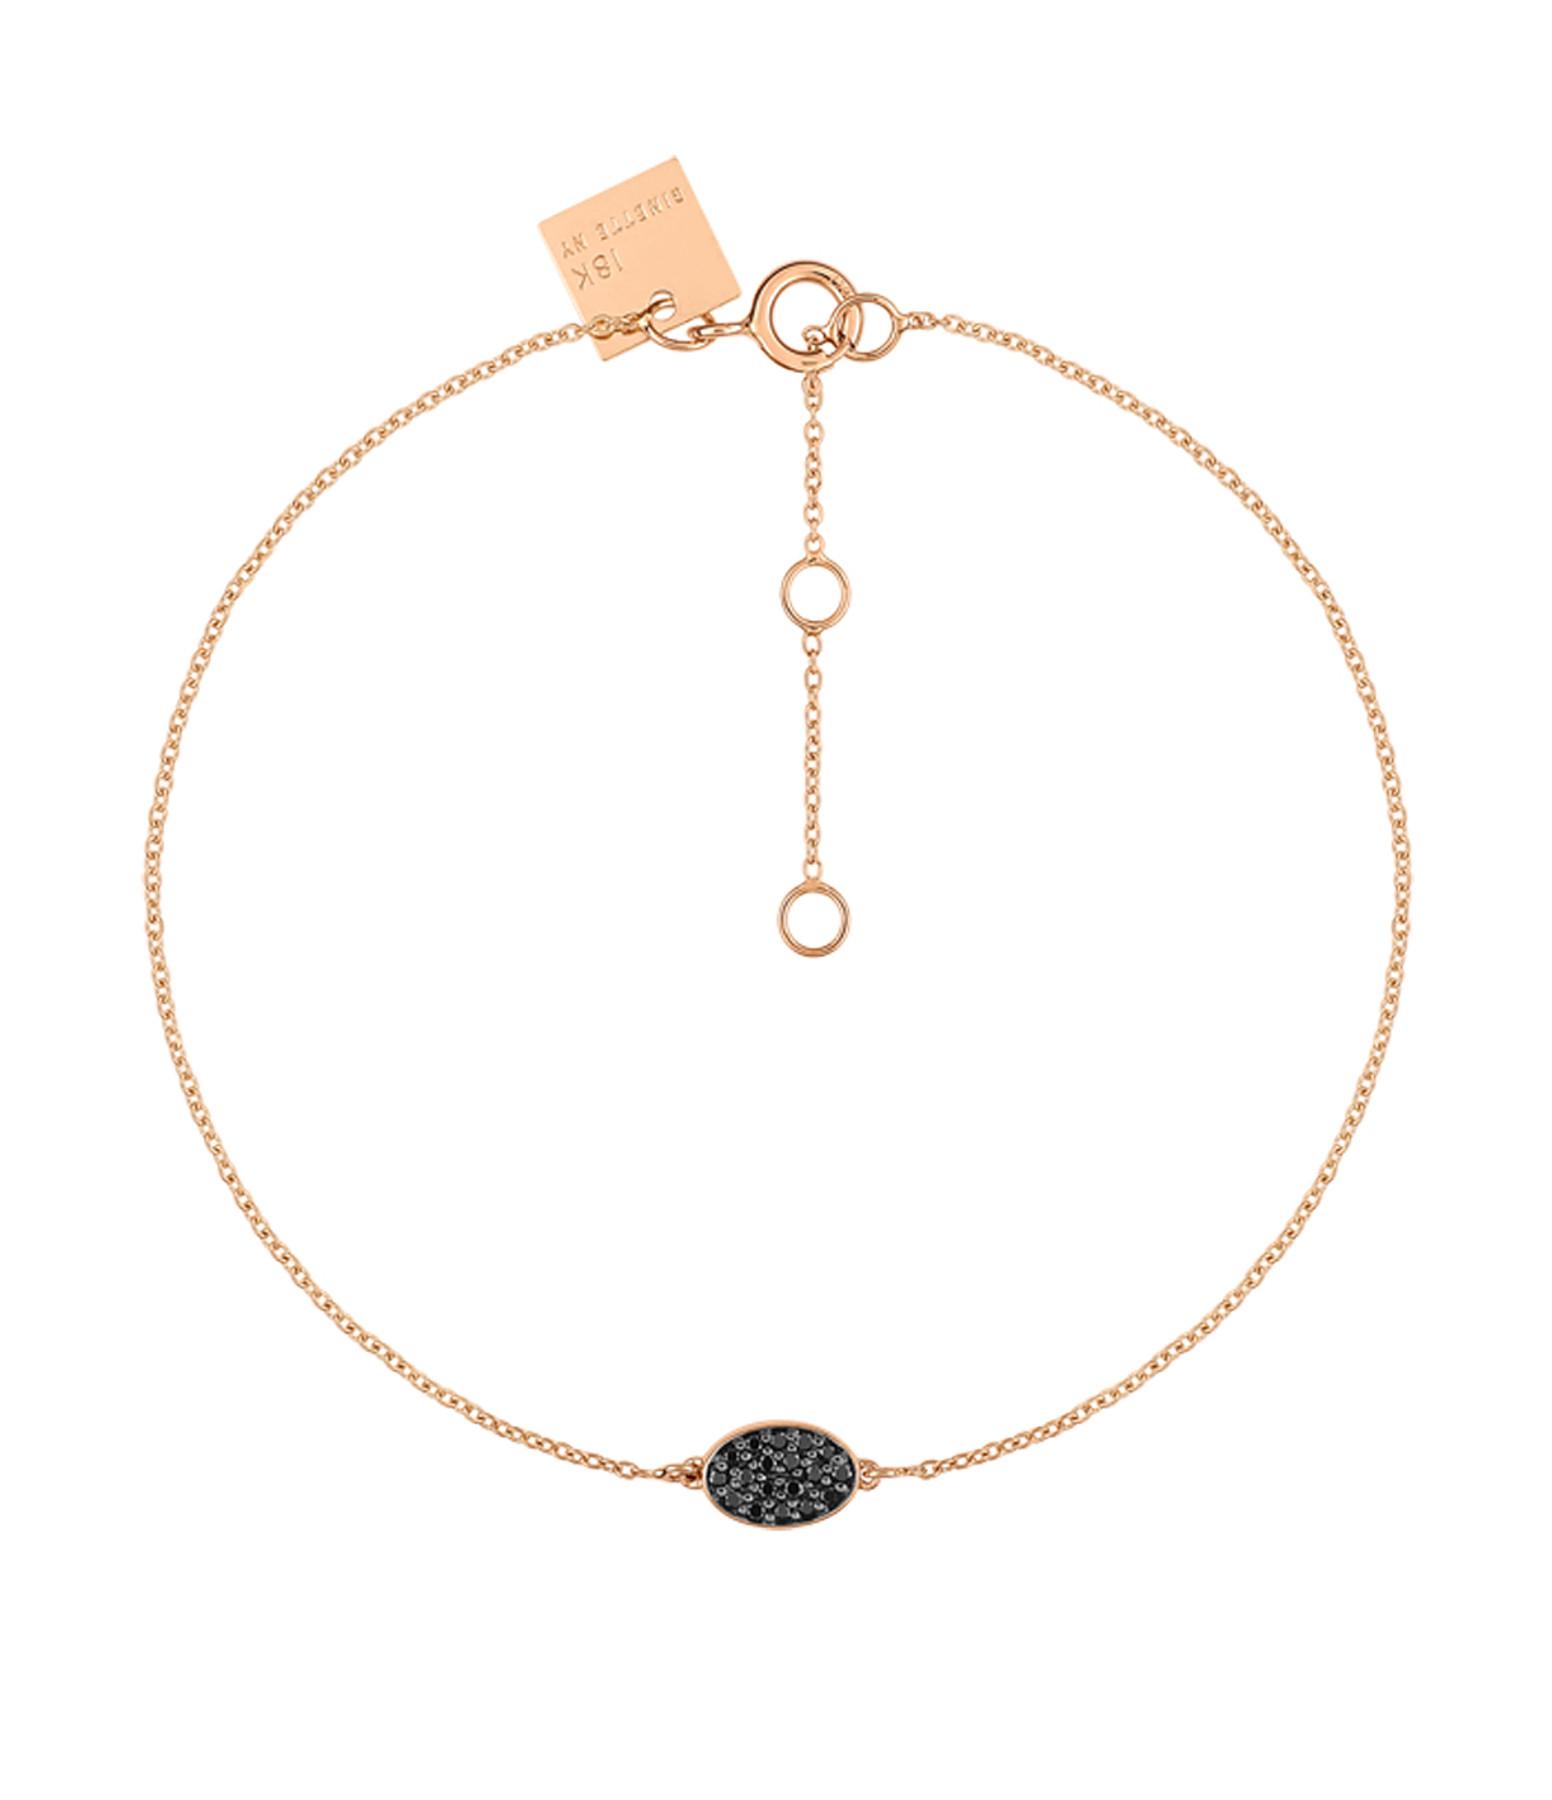 GINETTE_NY - Bracelet Sequin Or Rose Diamants Noirs